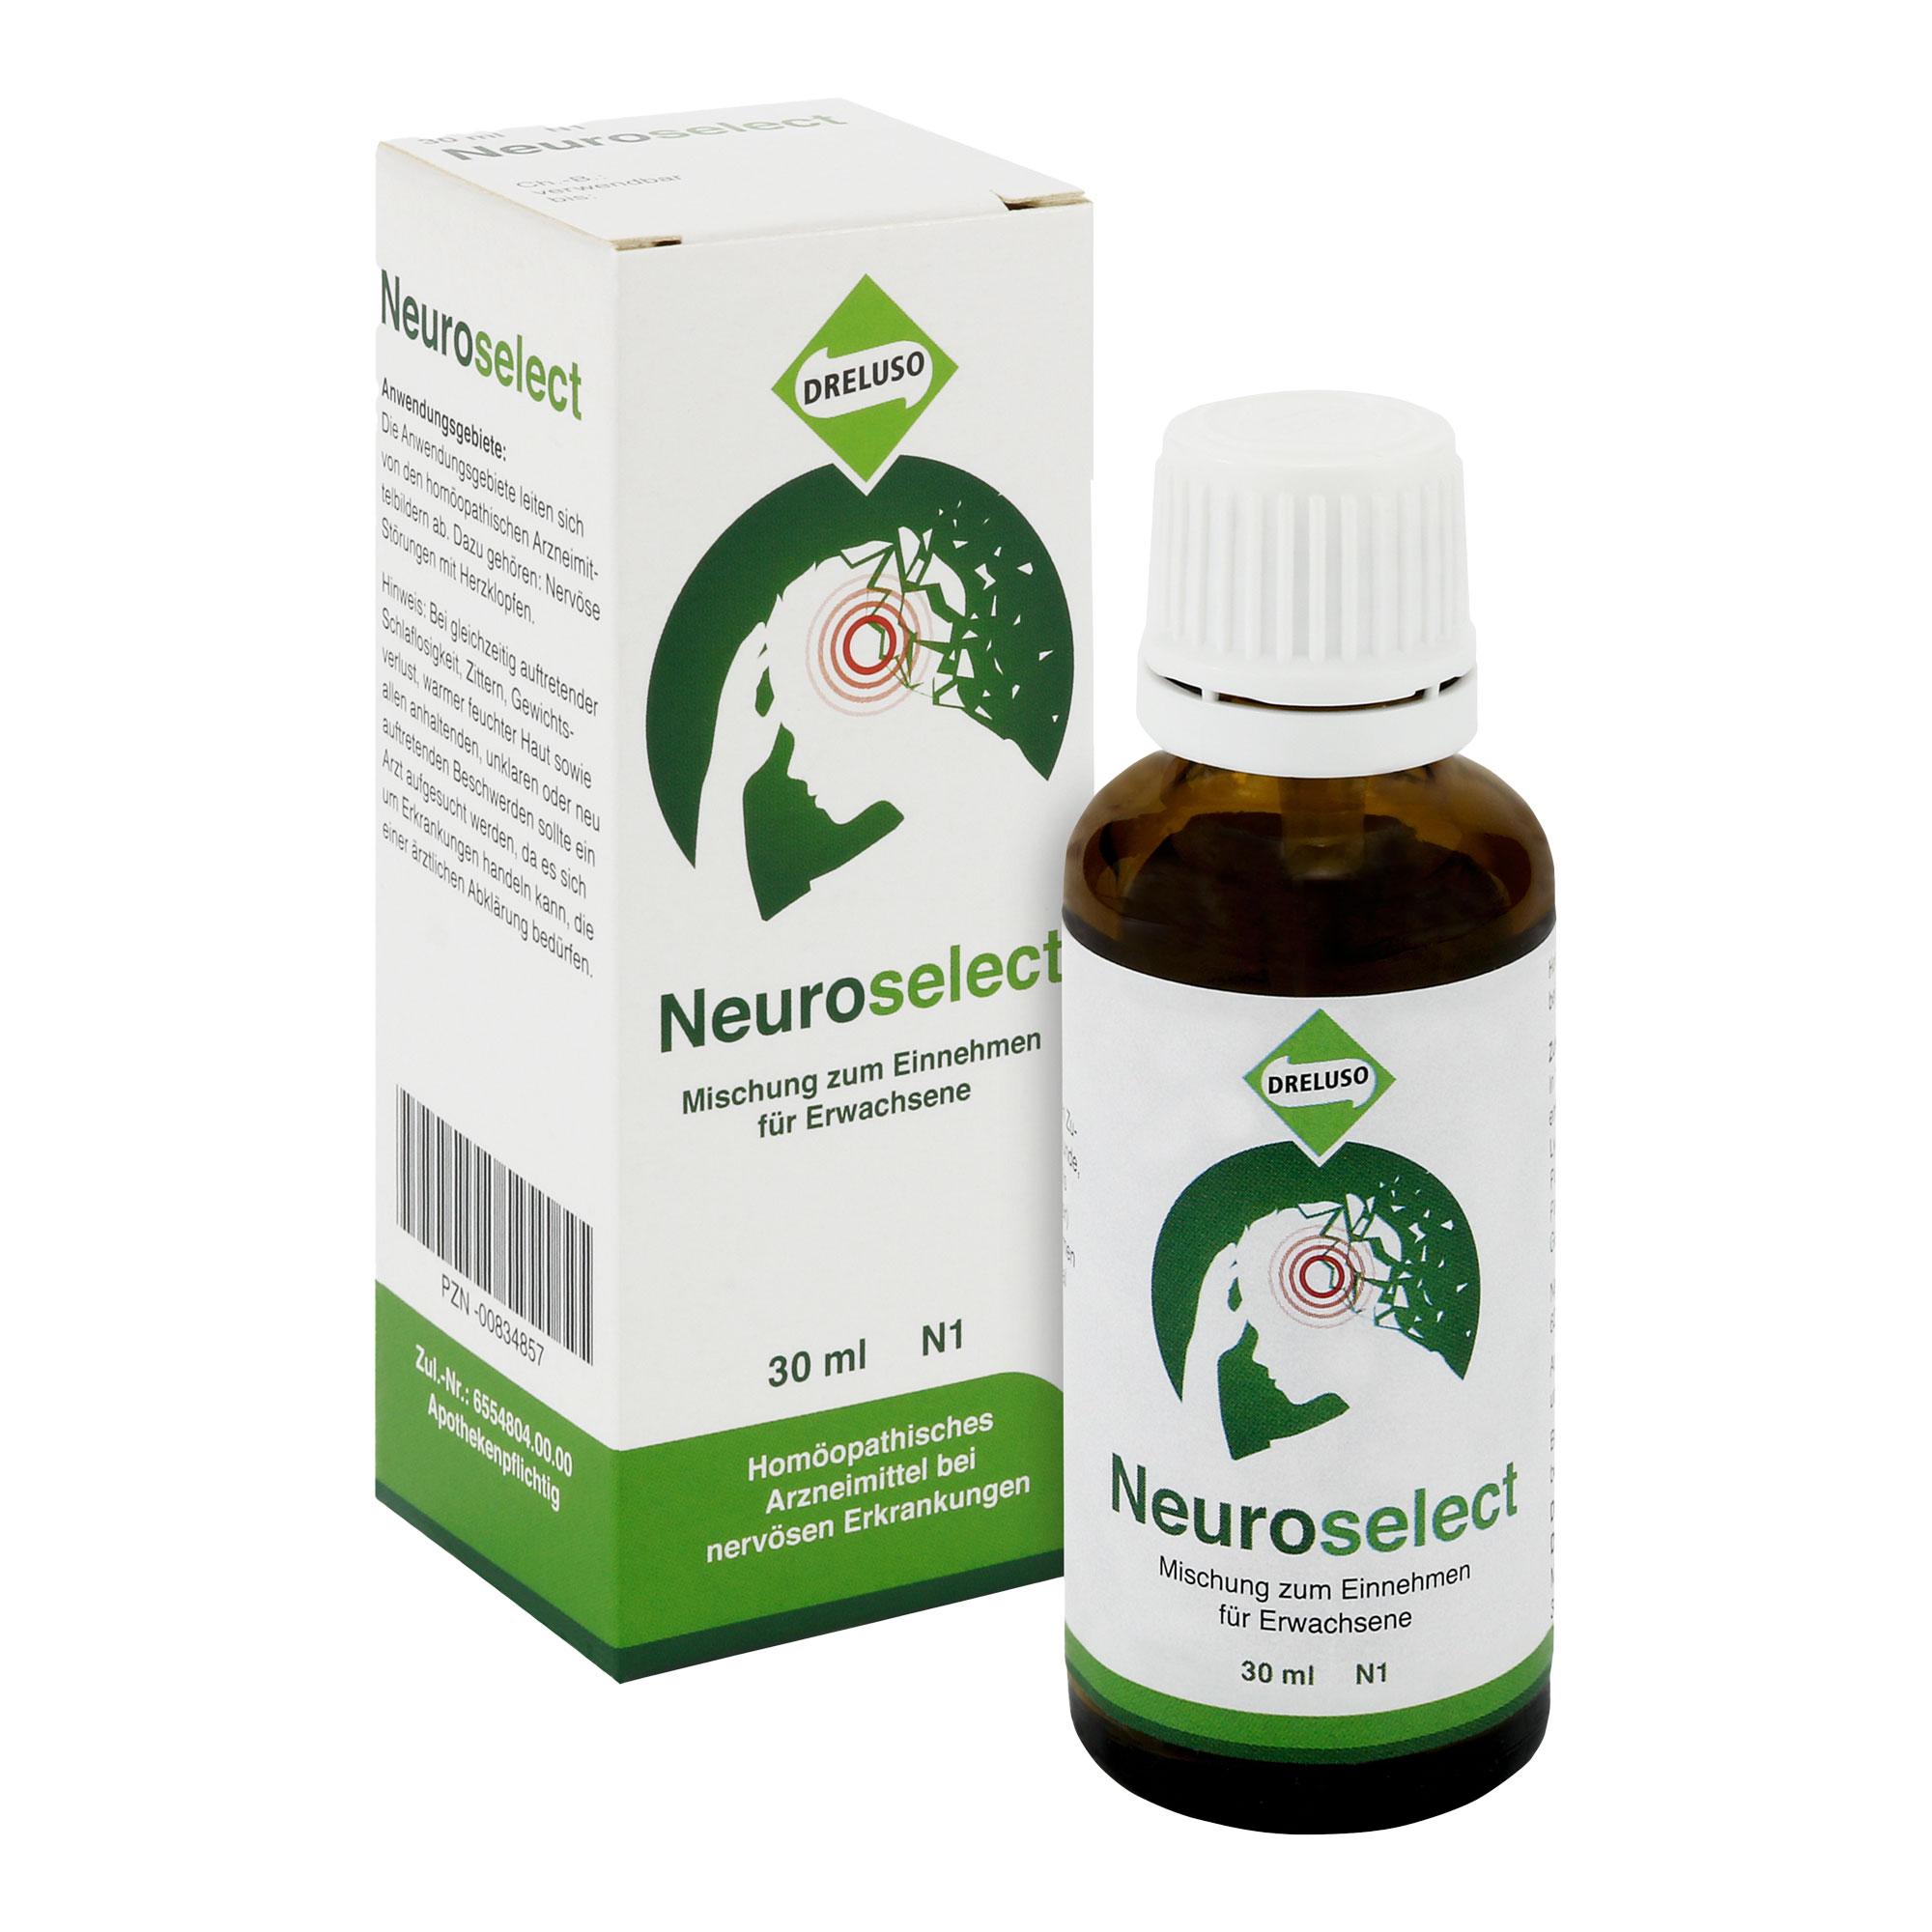 Neuroselect